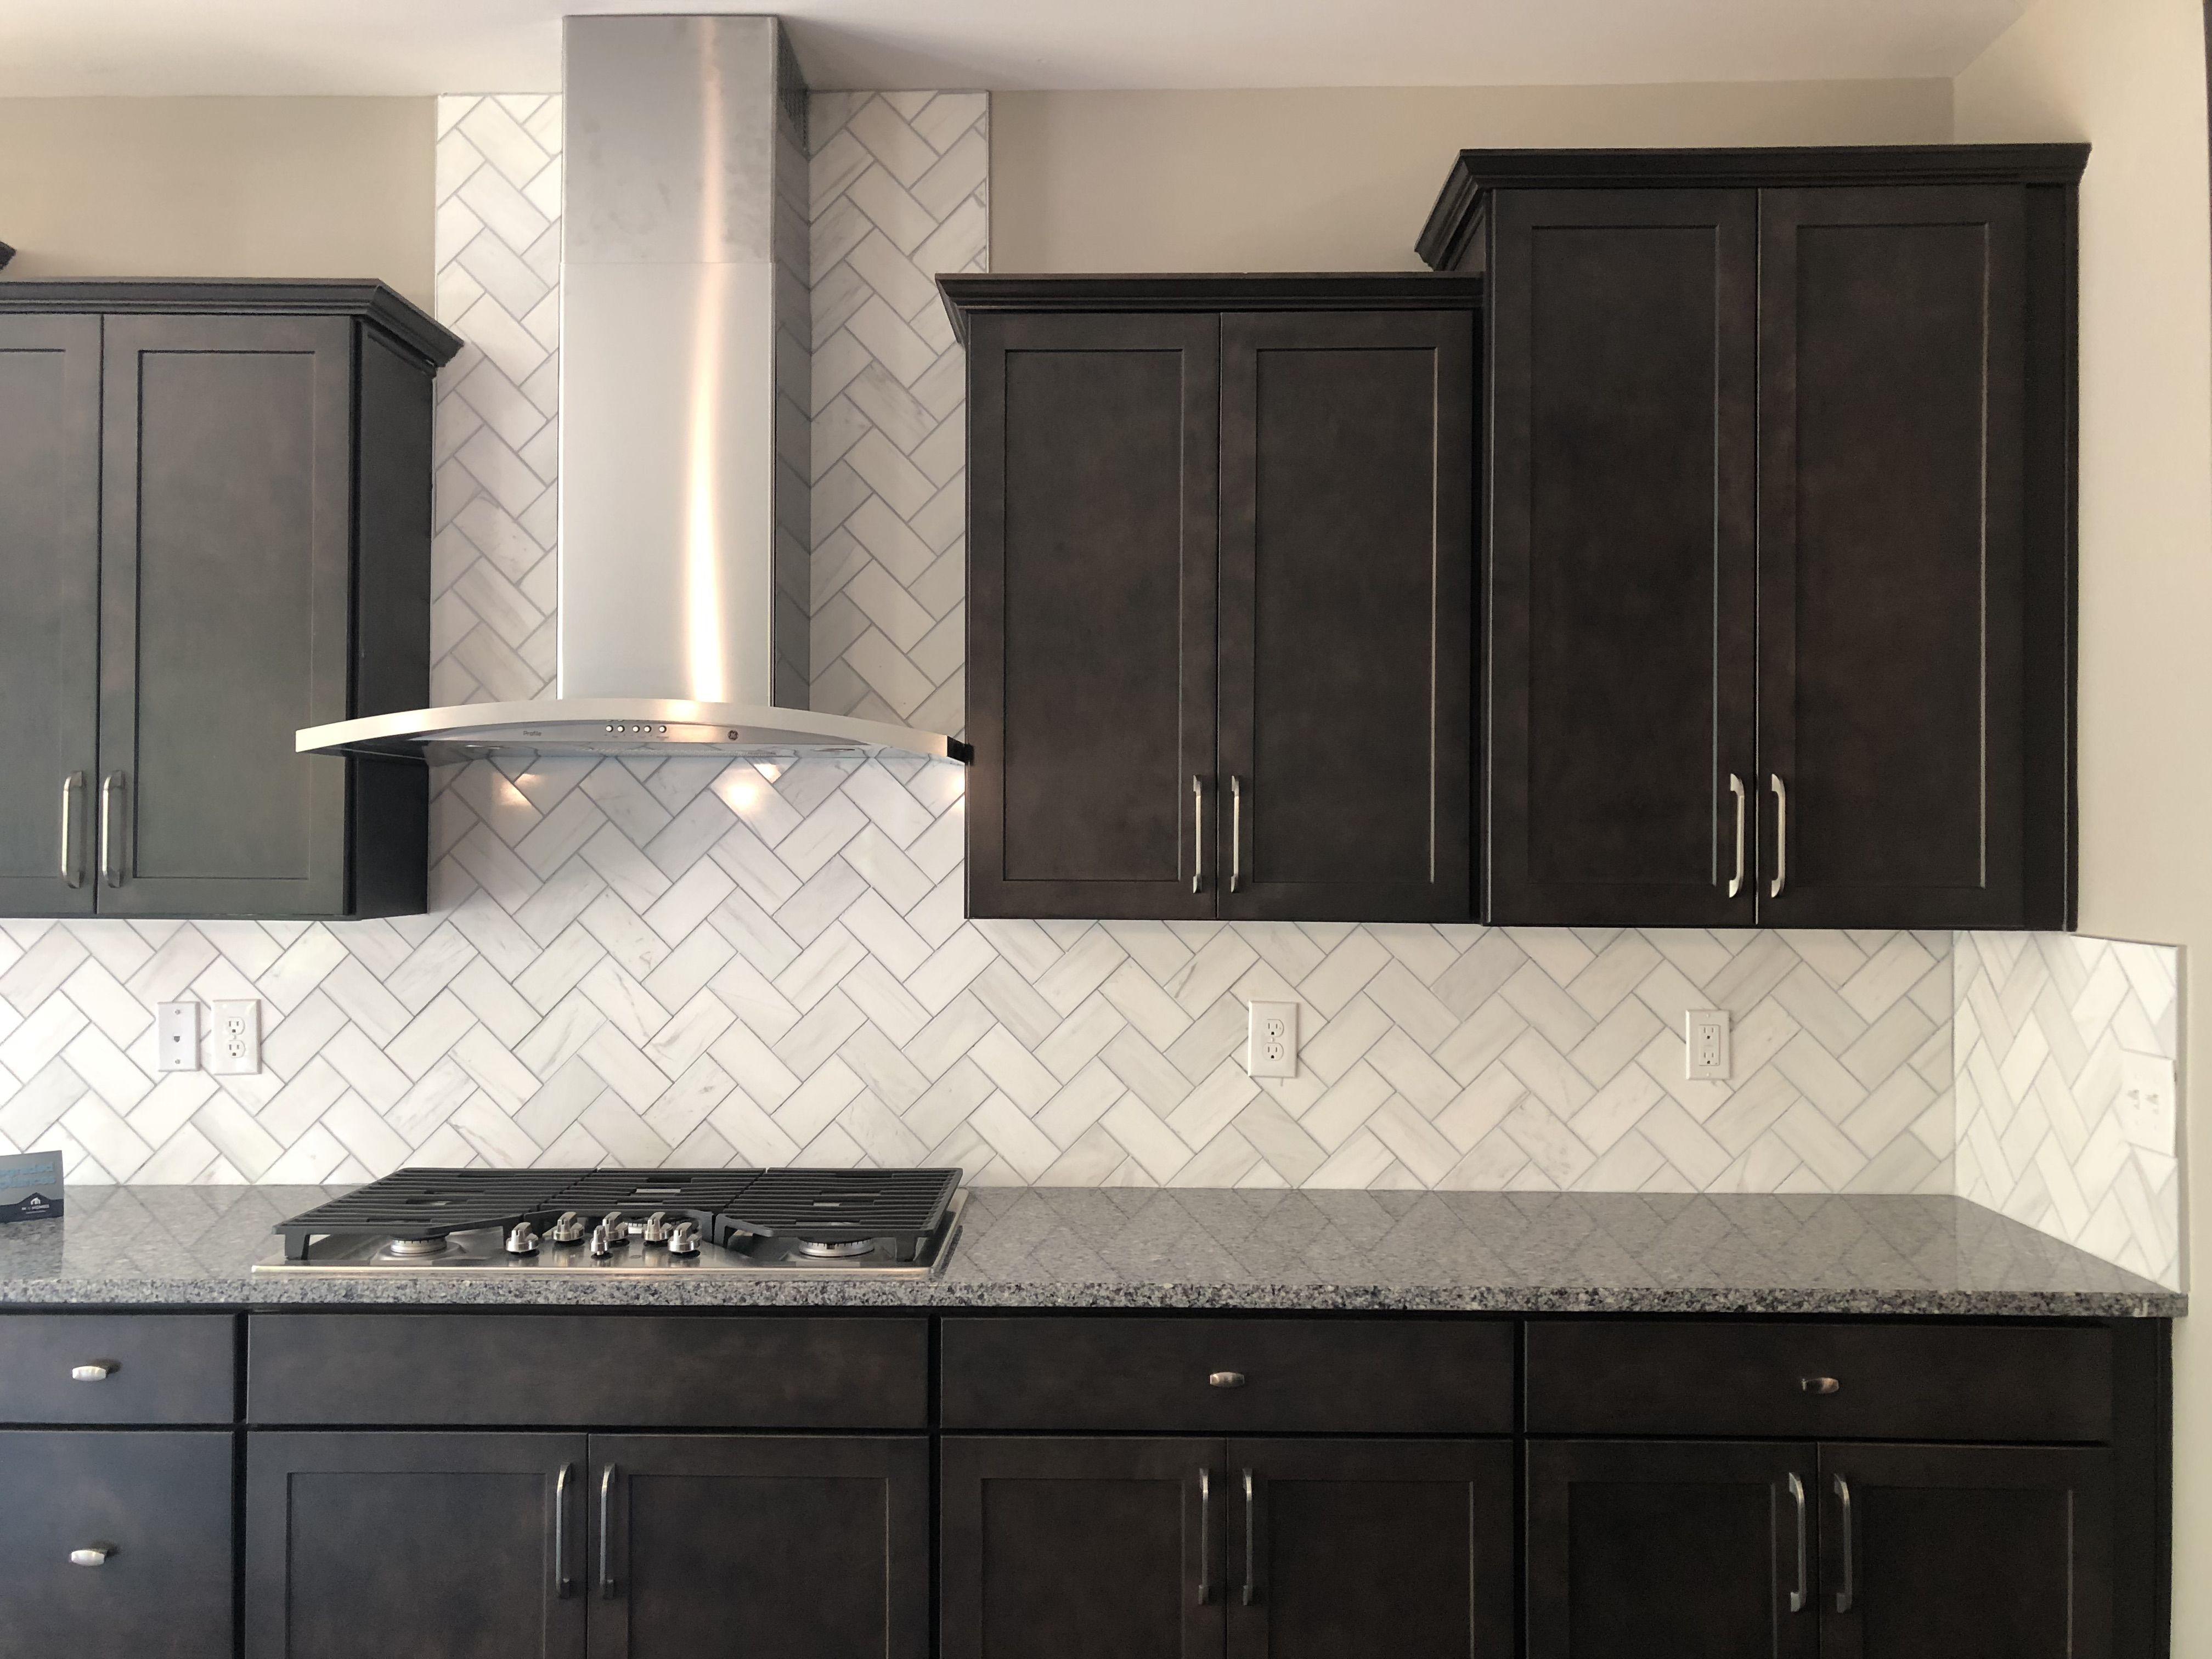 herringbone backsplash kitchen